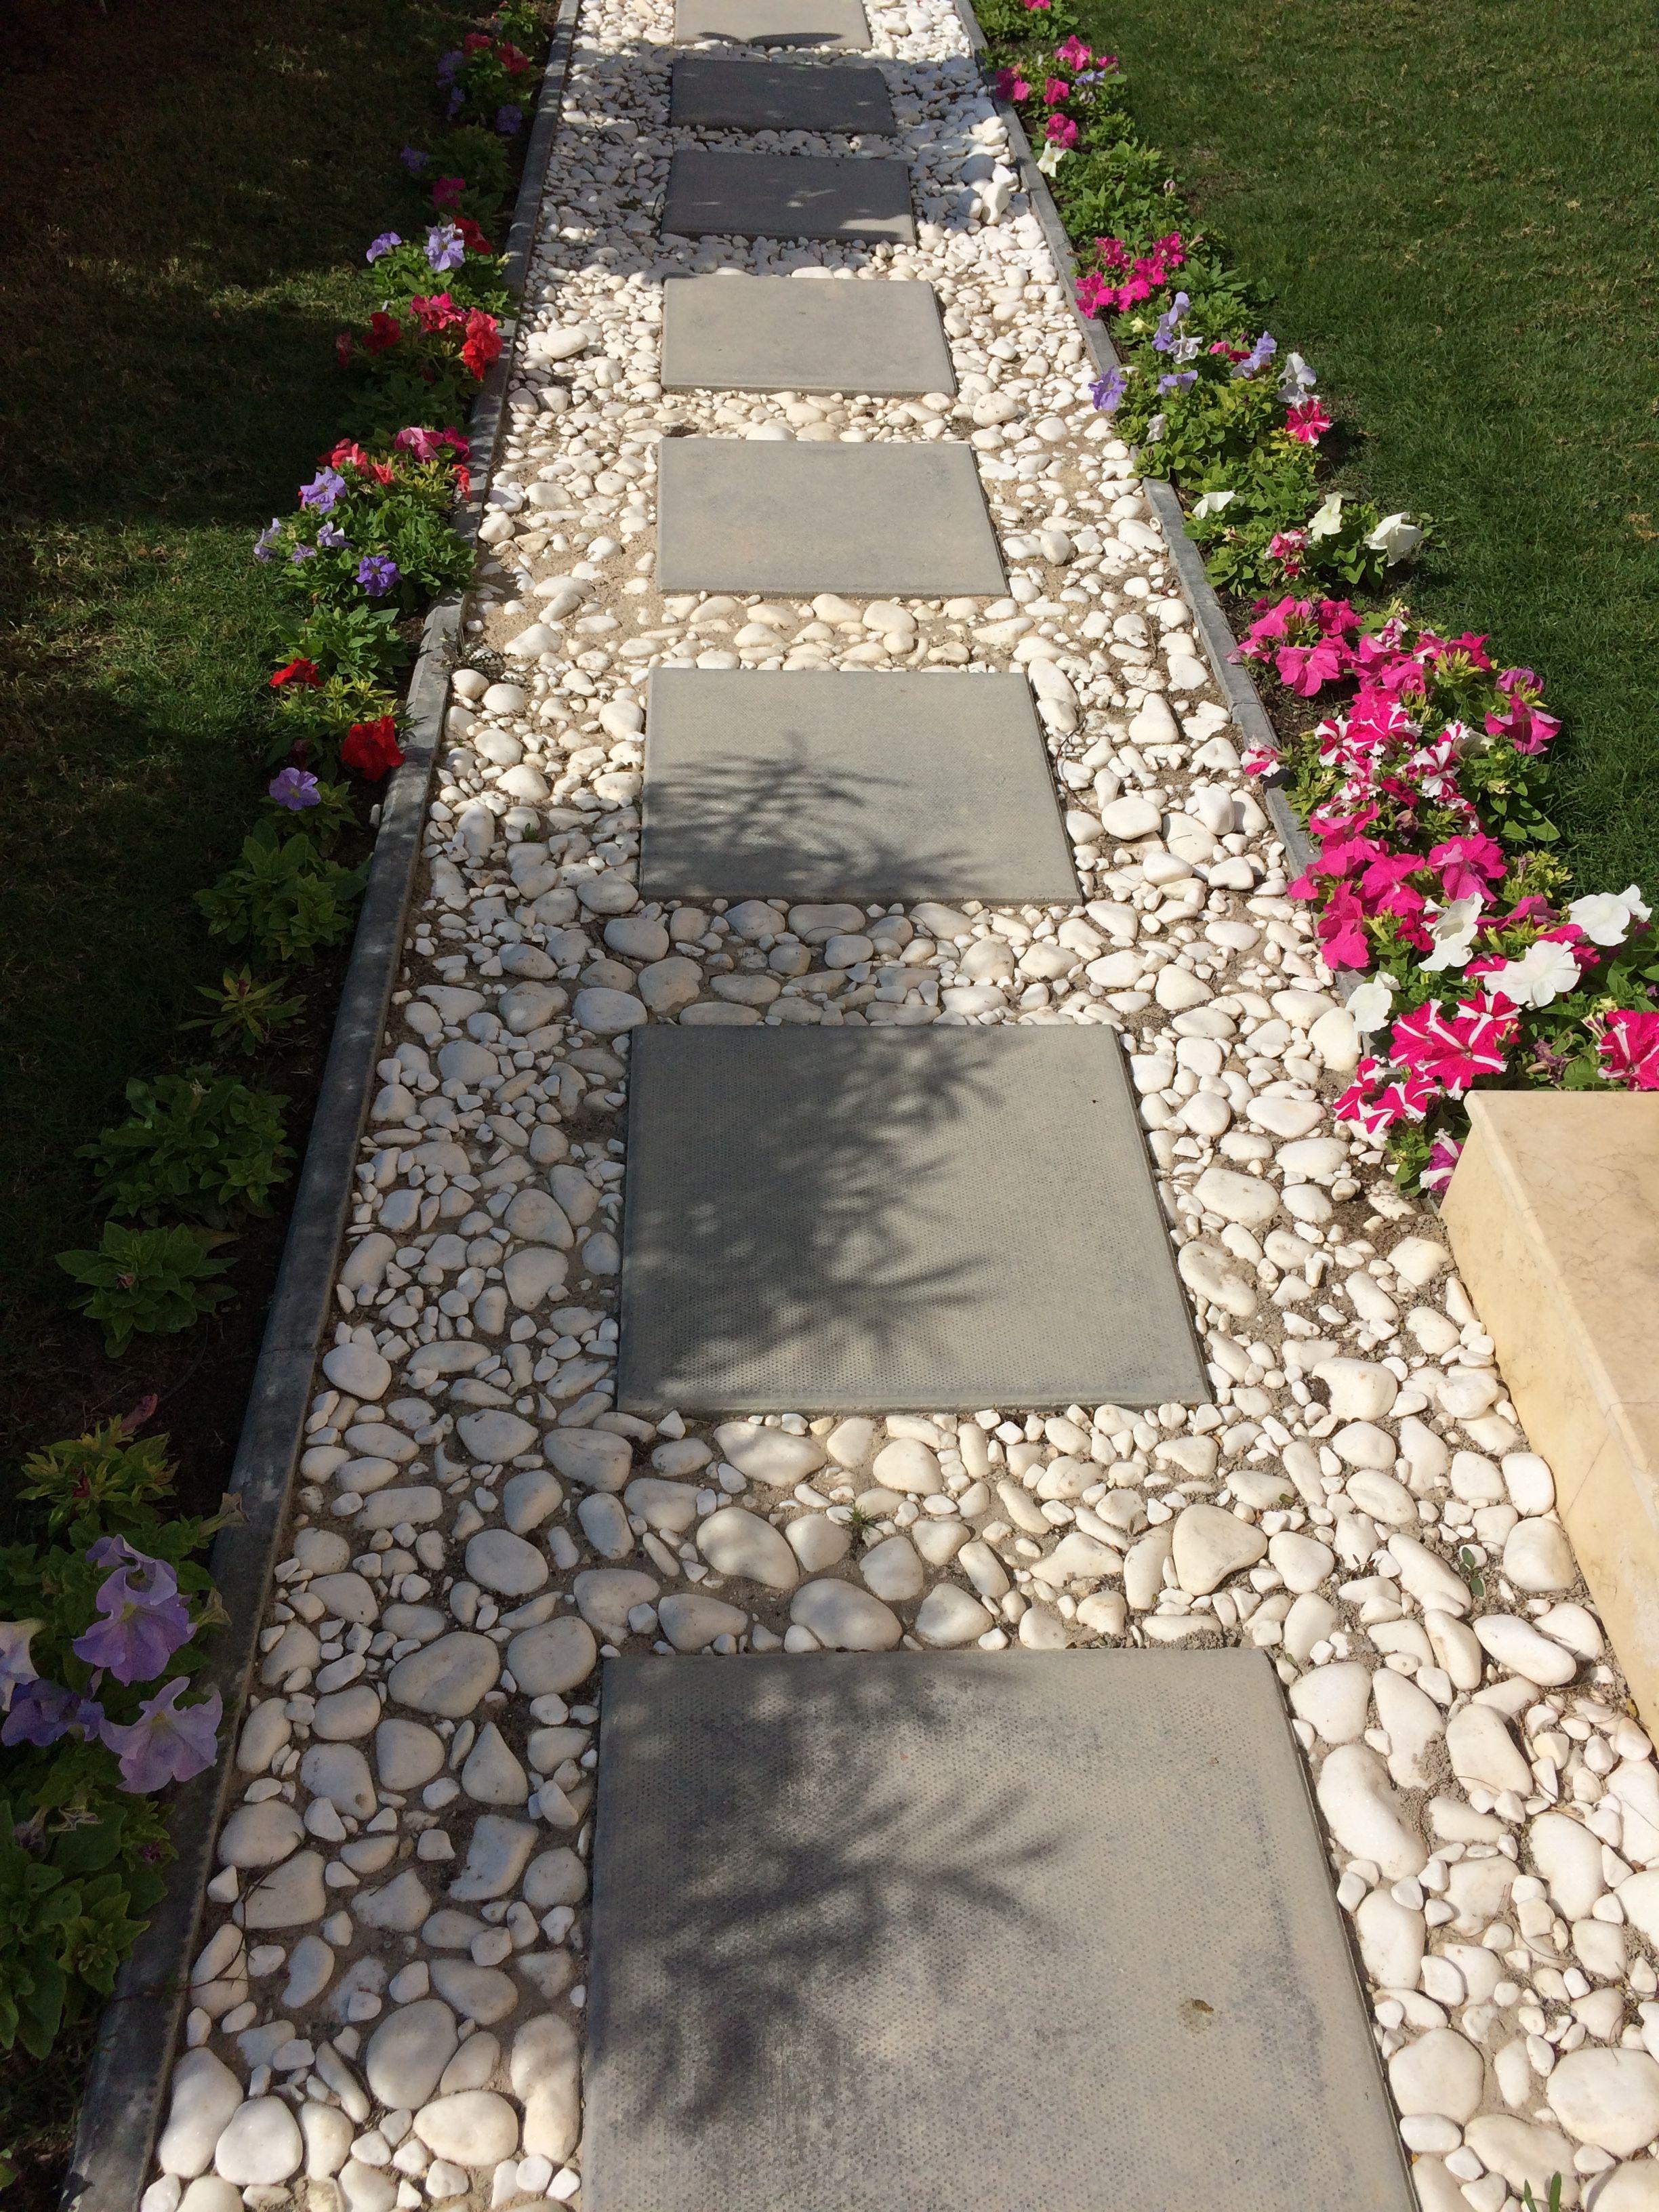 cement block tiles bordered